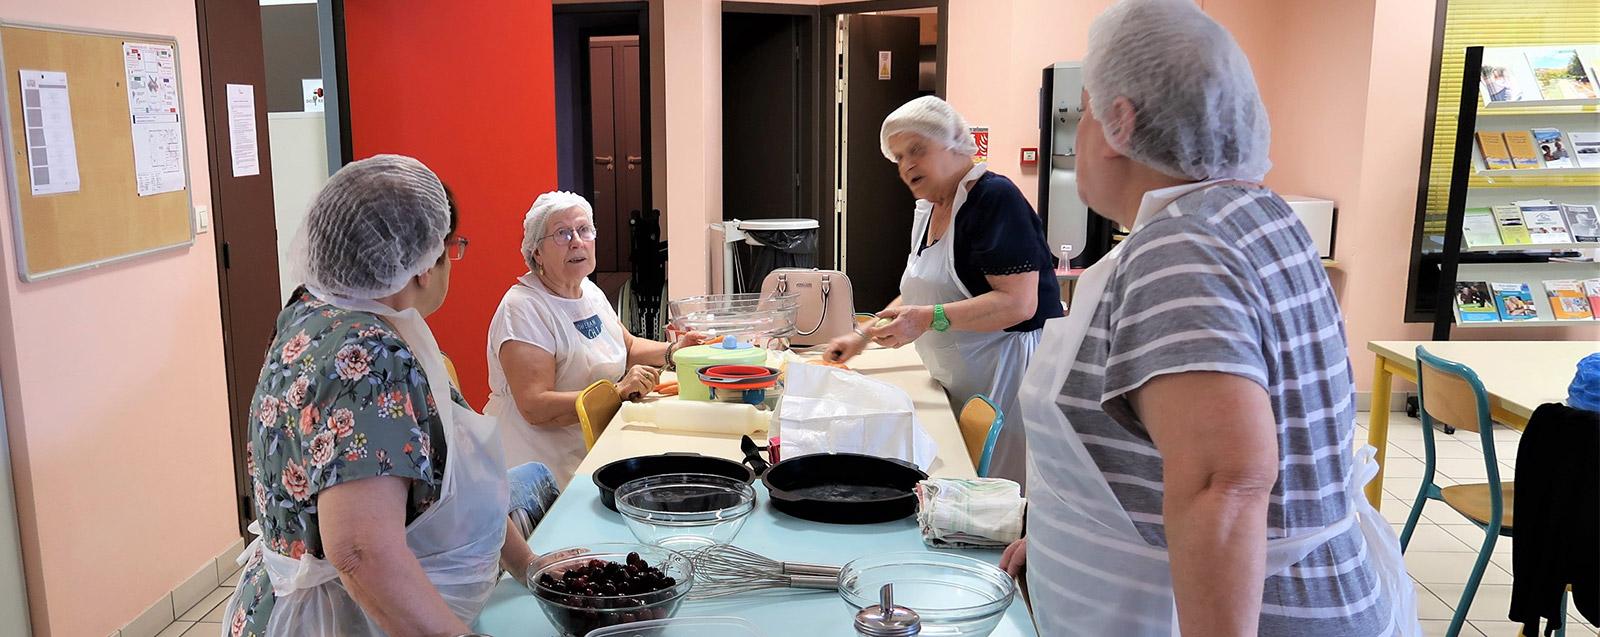 Atelier cuisine au Phare, juin 2019